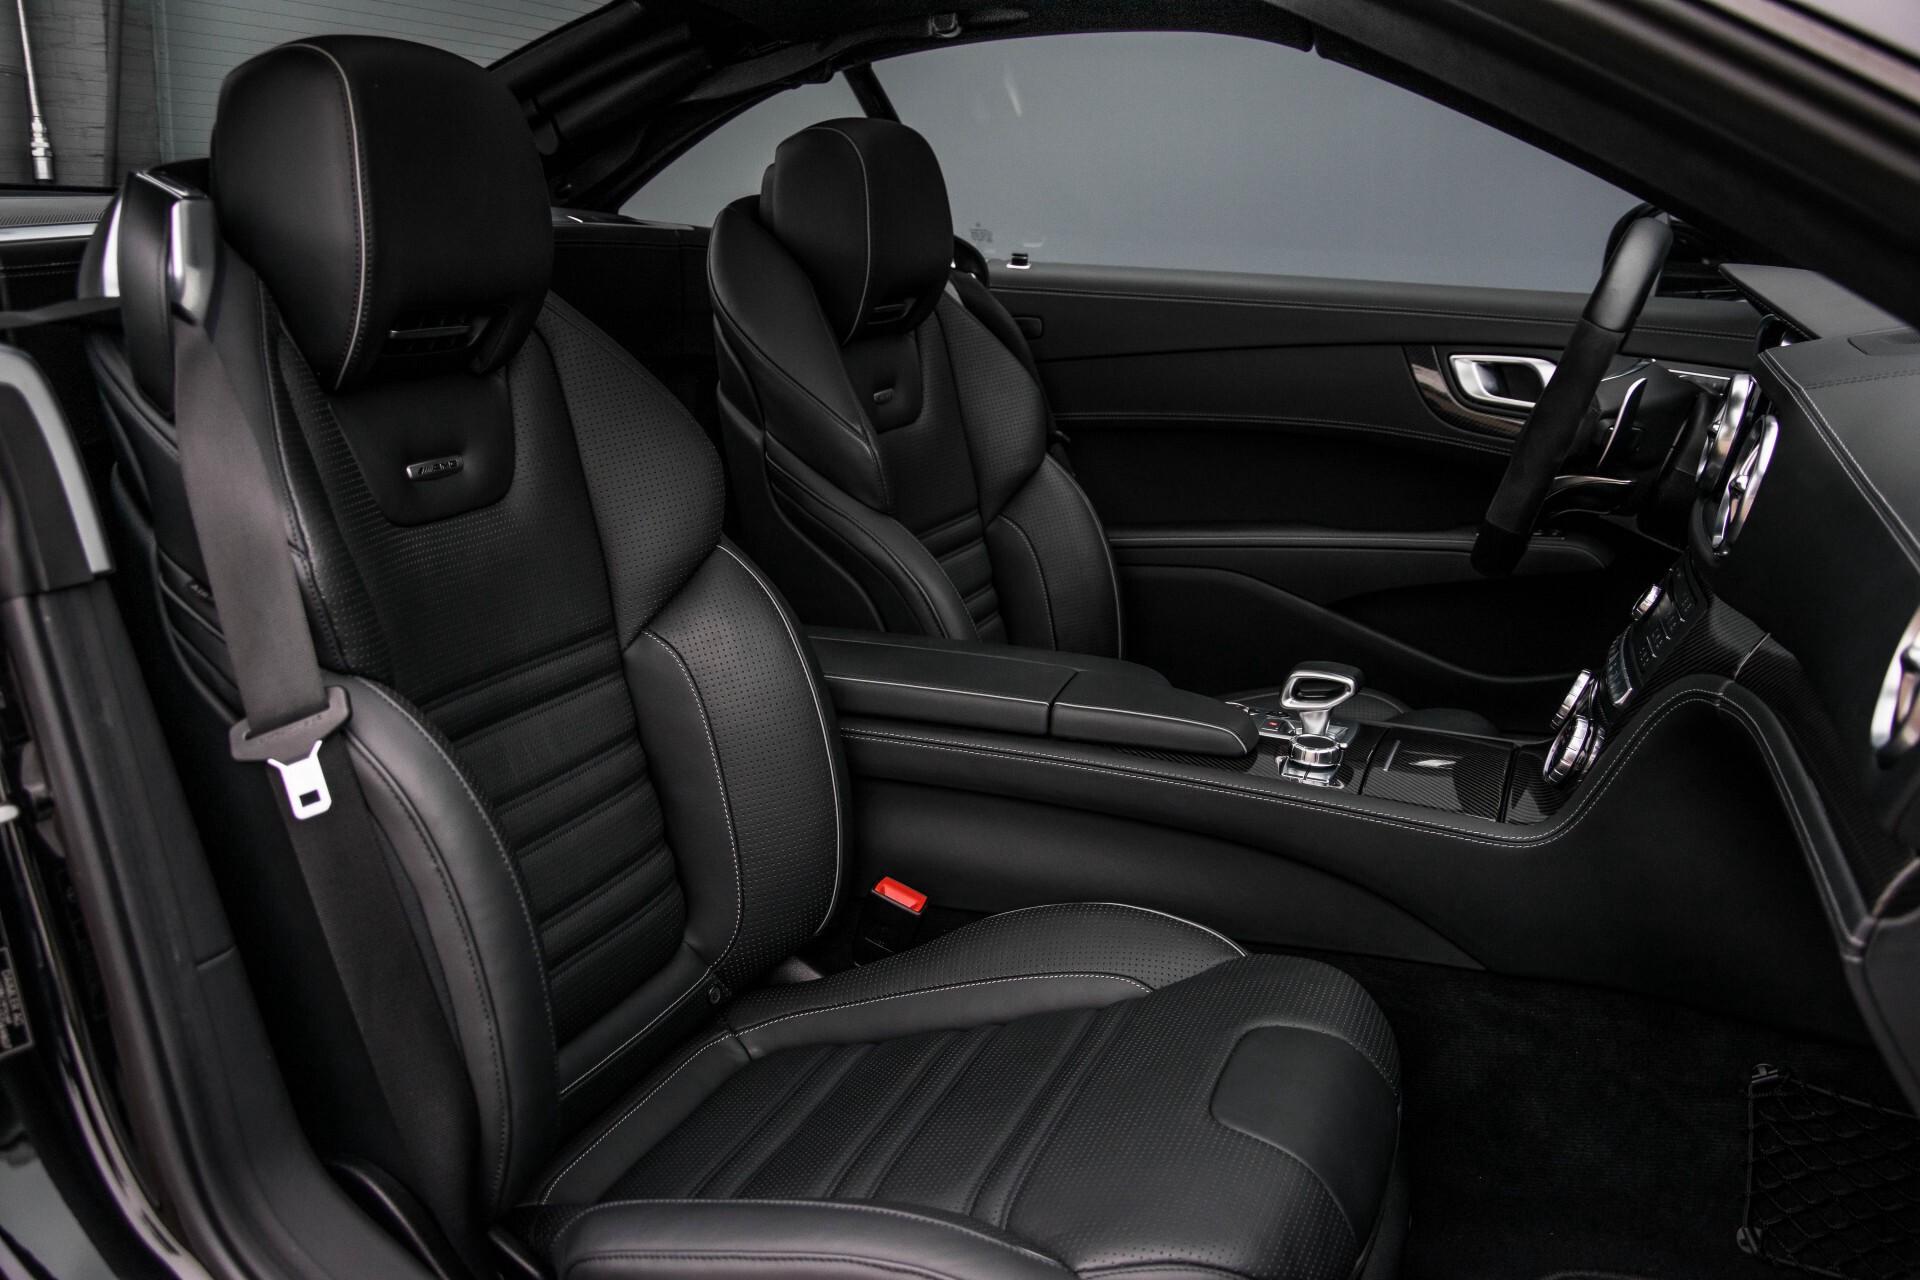 Mercedes-Benz SL-Klasse 63 AMG Keramisch/Bang & Olufsen/Designo/Carbon/Drivers Package Aut7 Foto 5